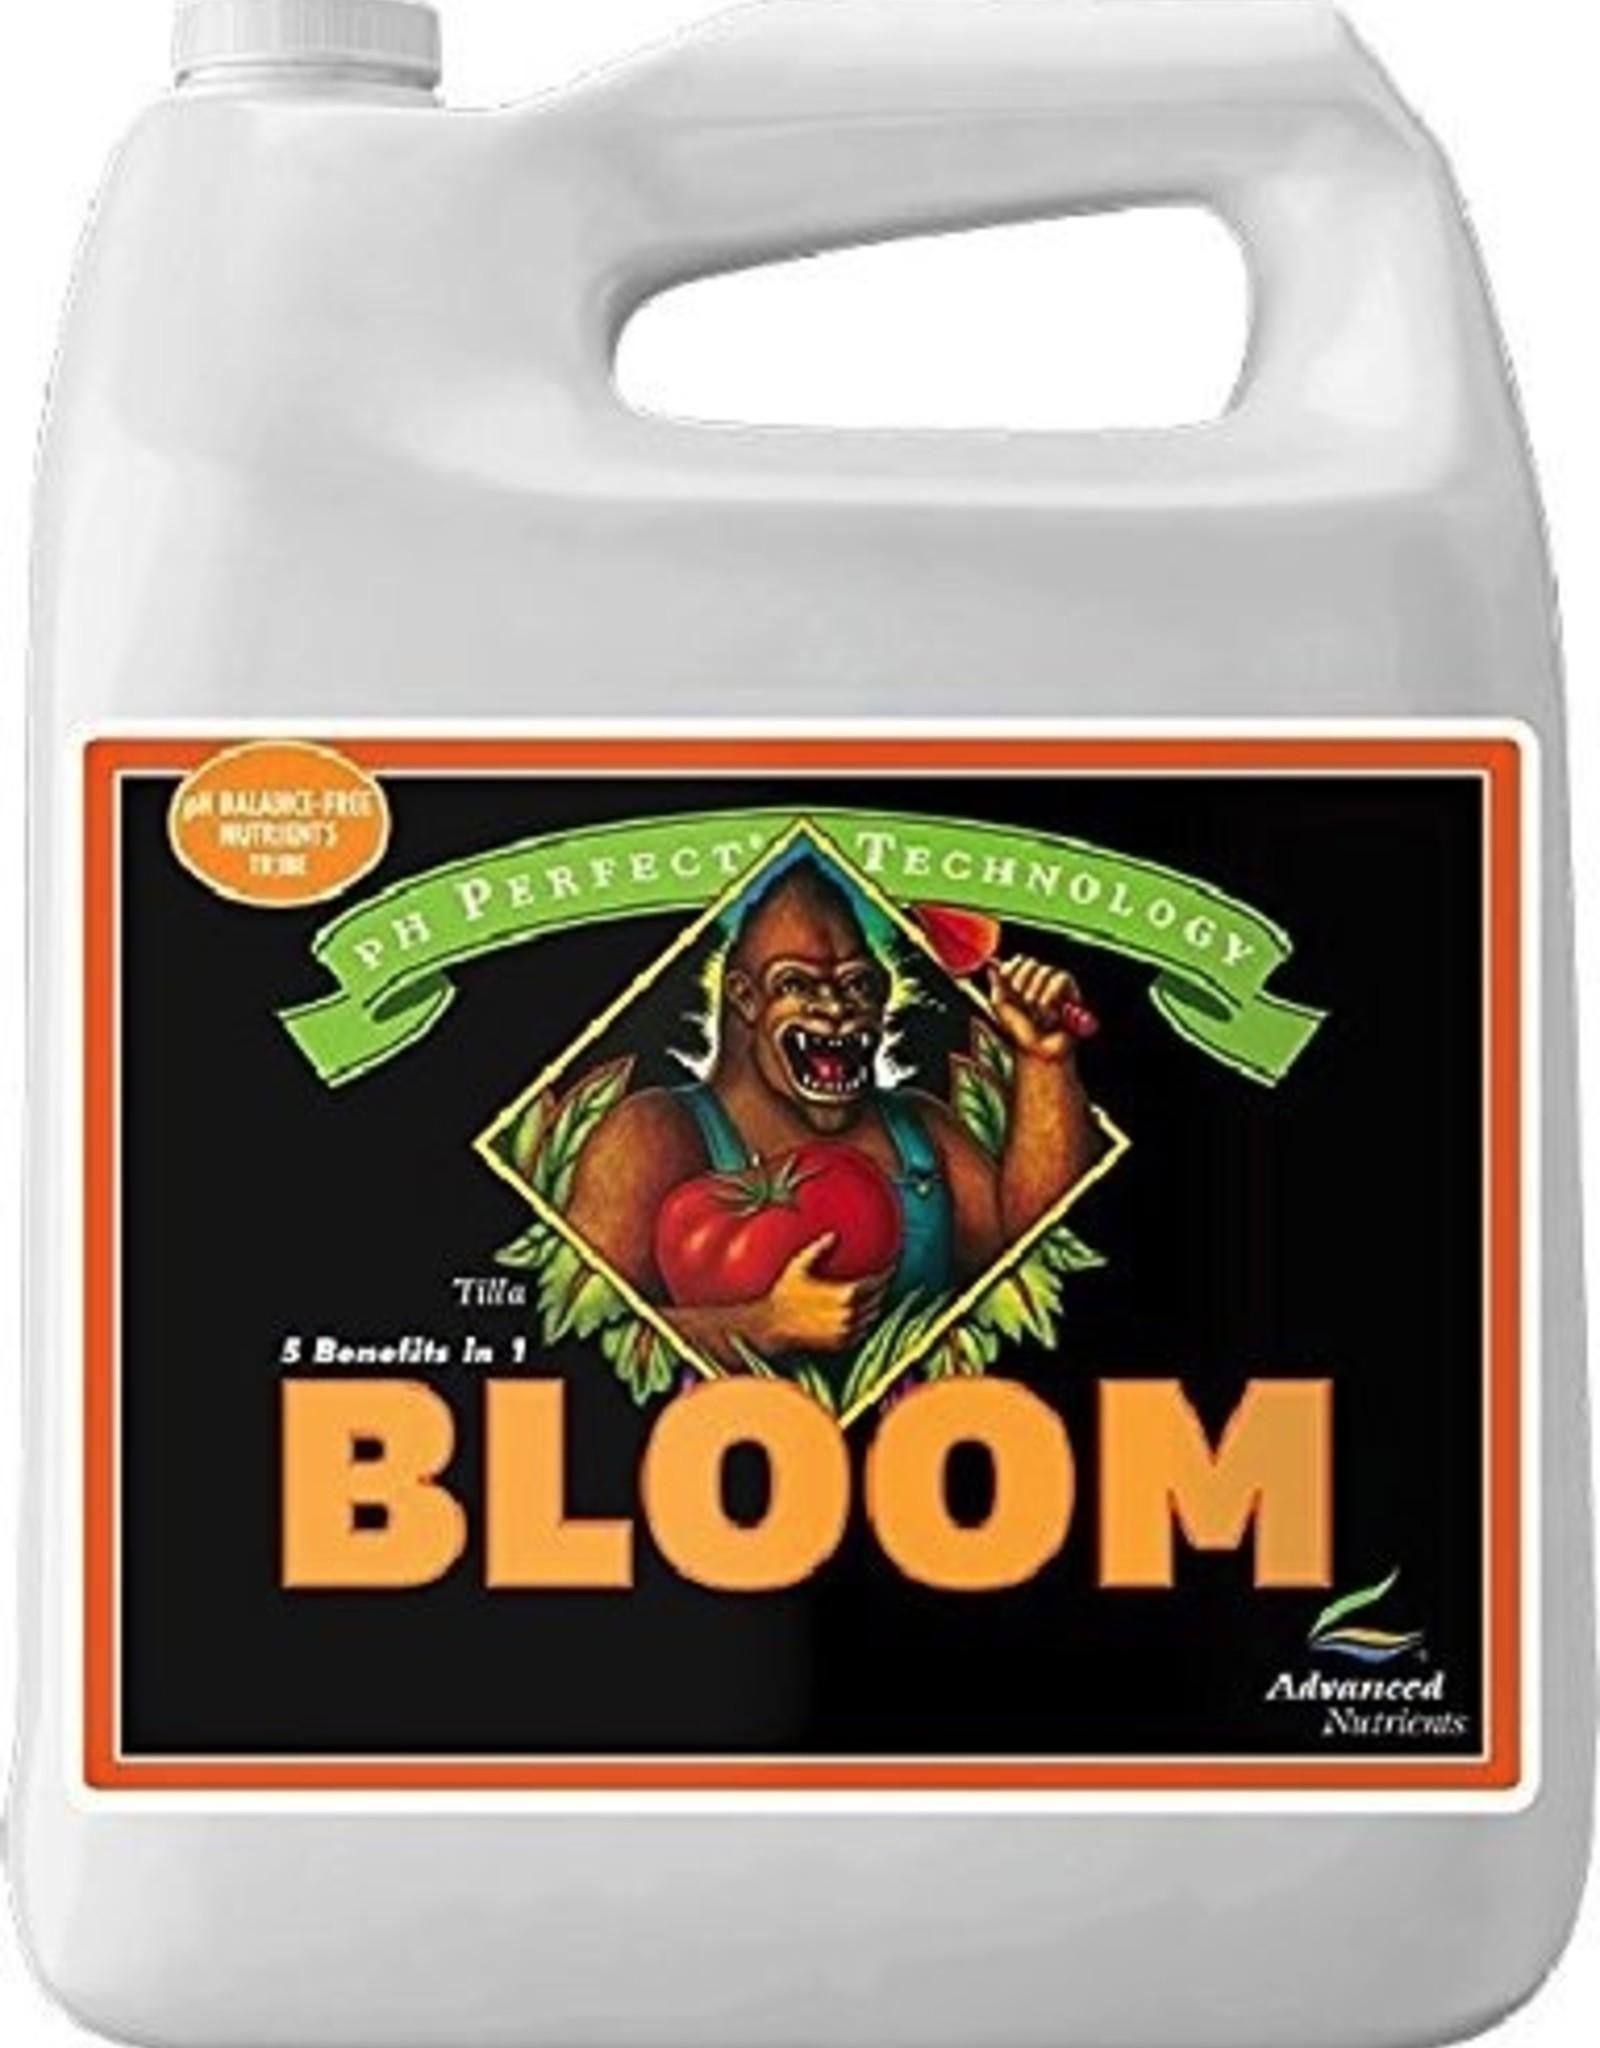 ADVANCED NUTRIENTS Advanced Nutrients Bloom ph Perfect Fertilizer, 4L